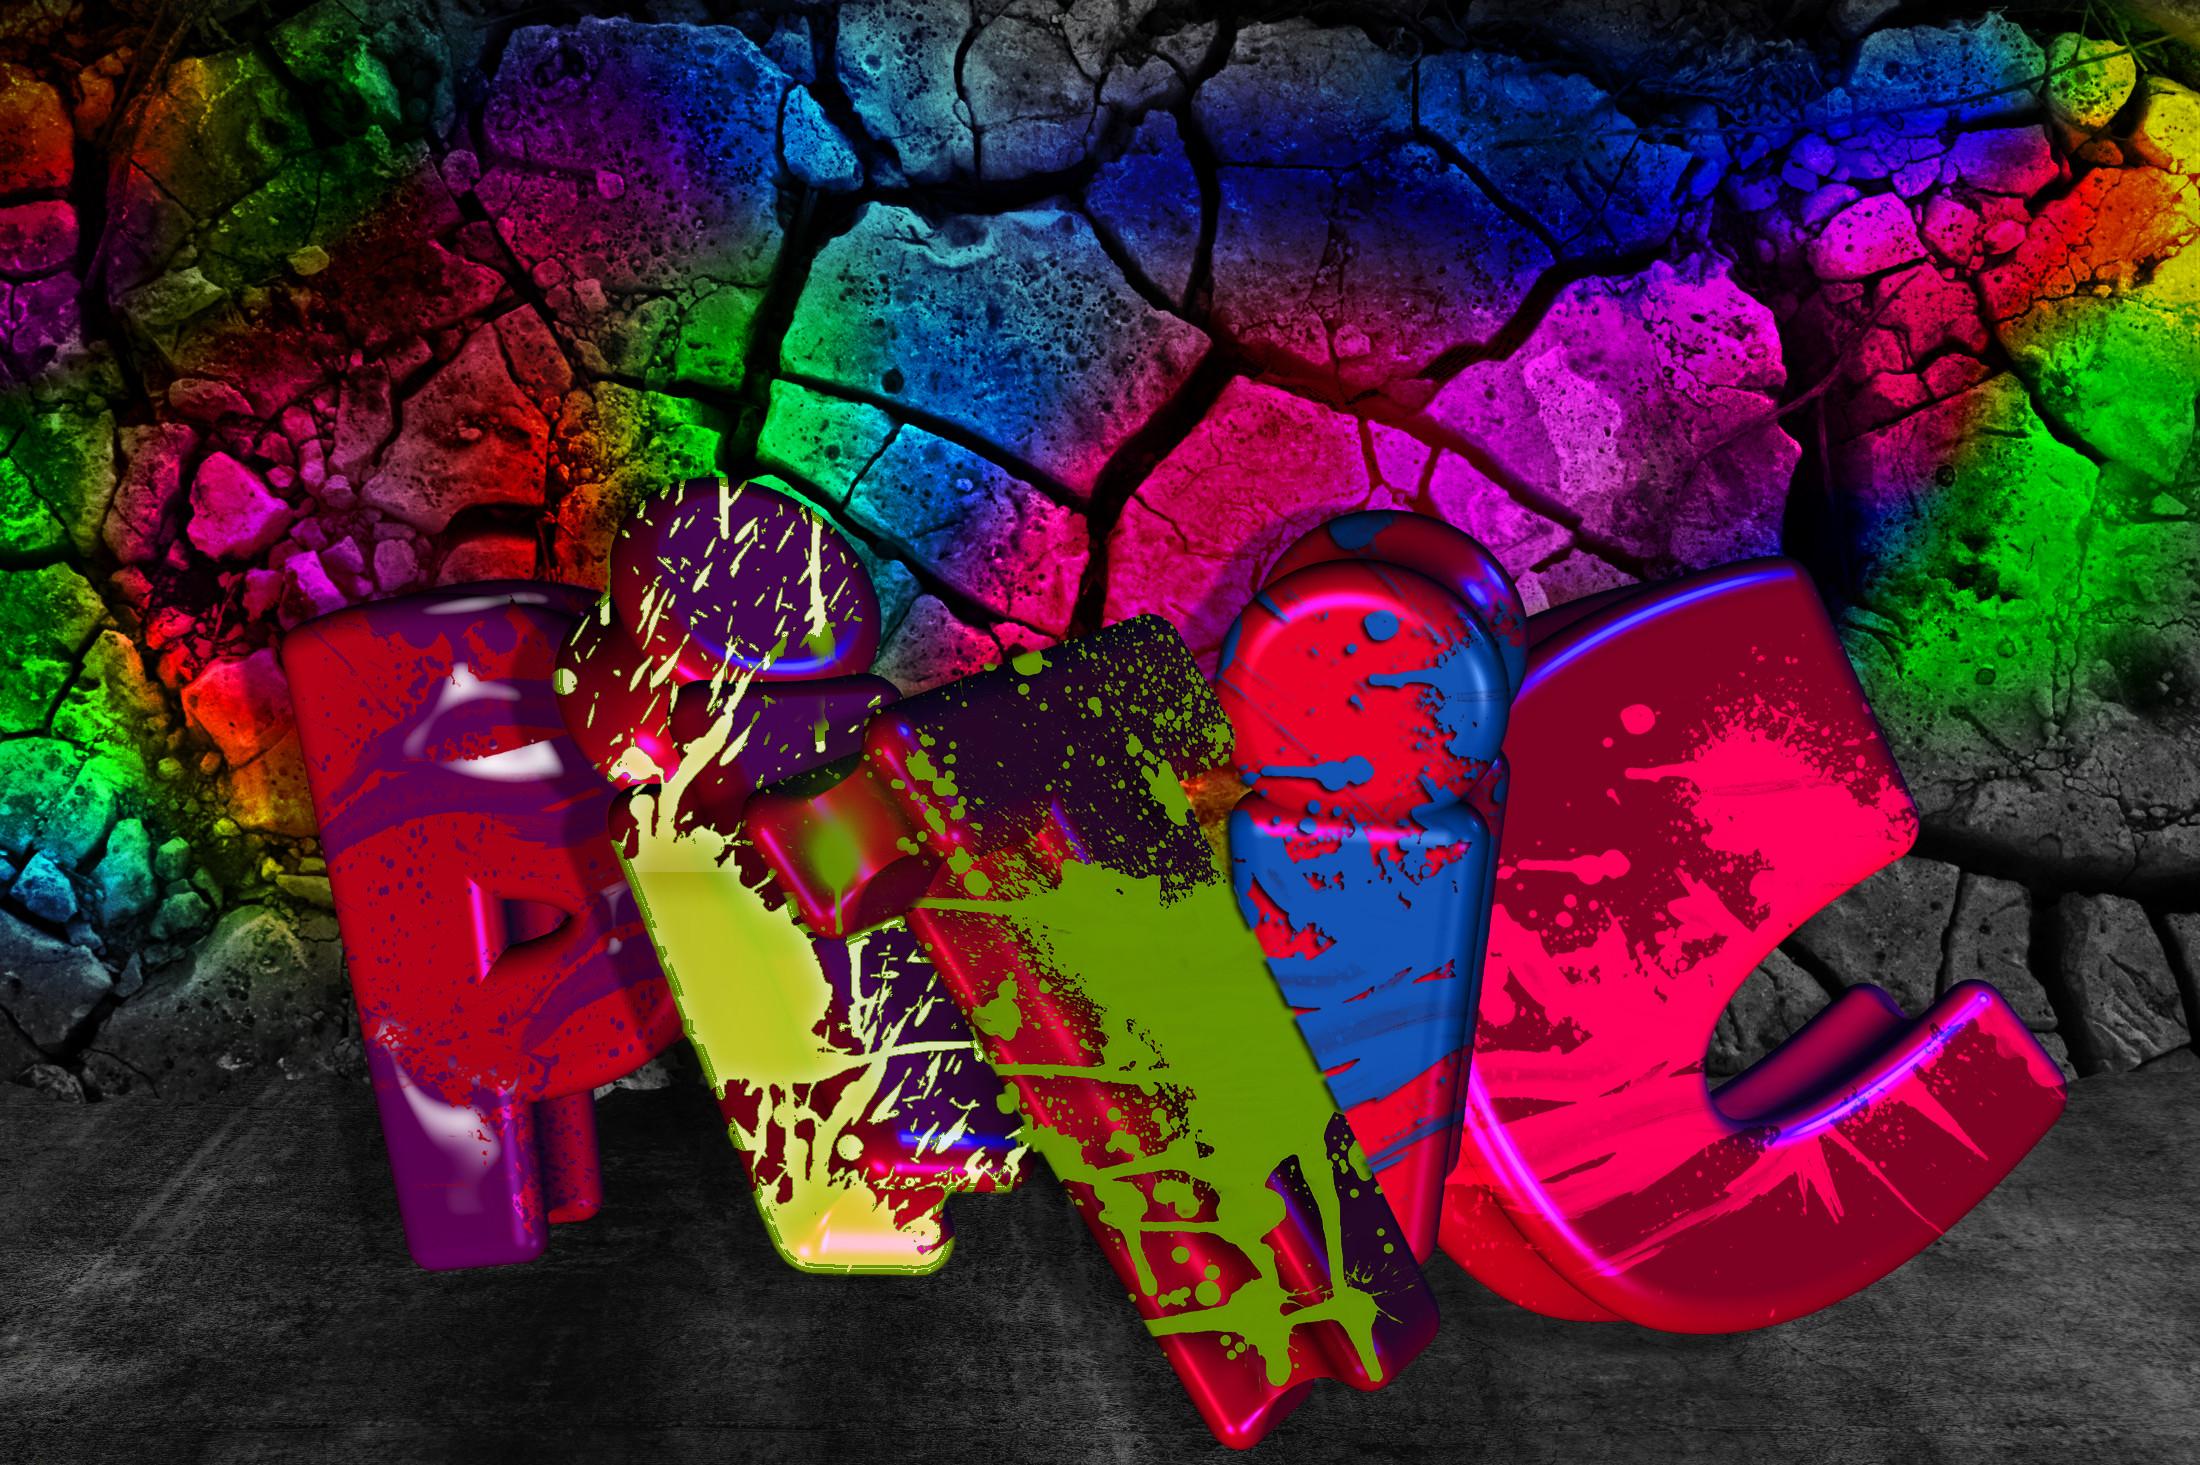 Graffiti hd wallpaper background image 2200x1465 id276499 wallpaper abyss